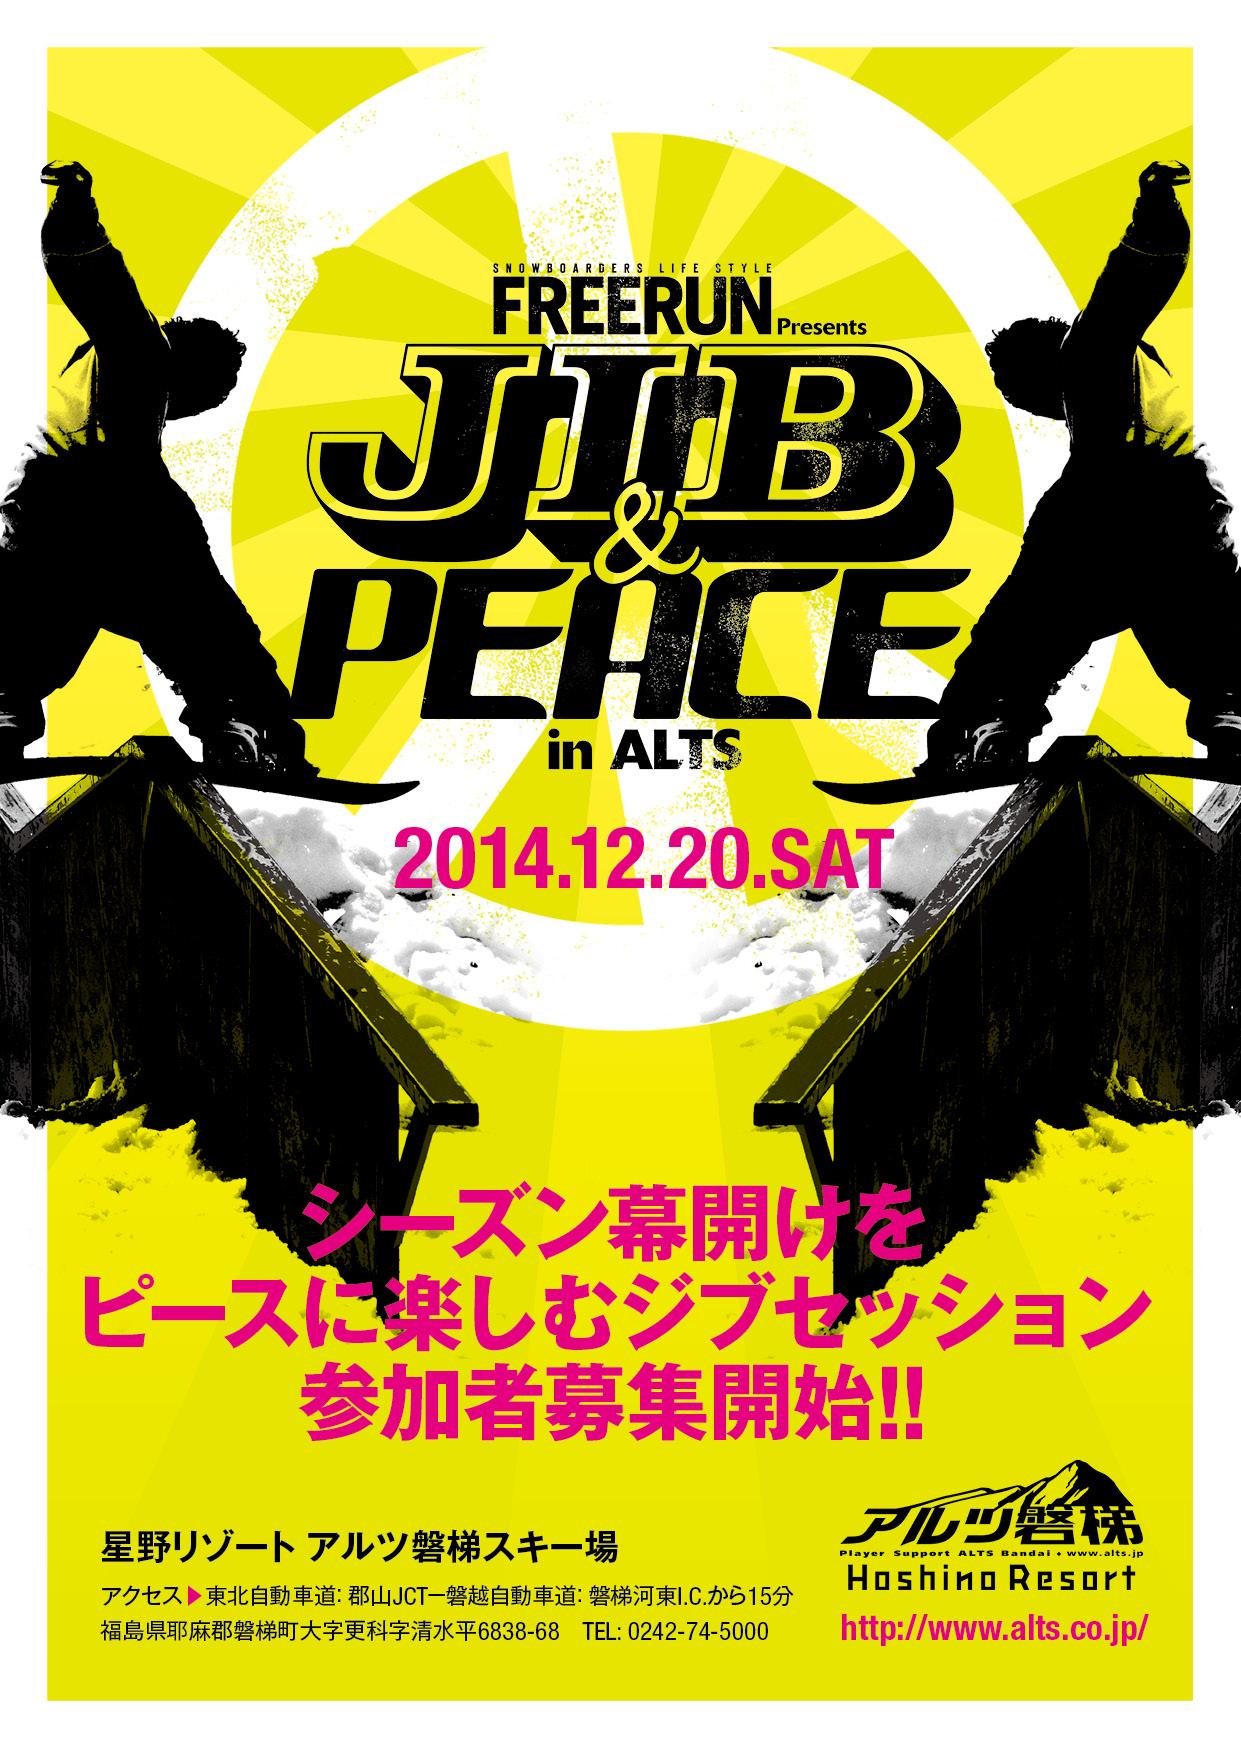 main_image_FREERN_JIB&PEACE_Flyer